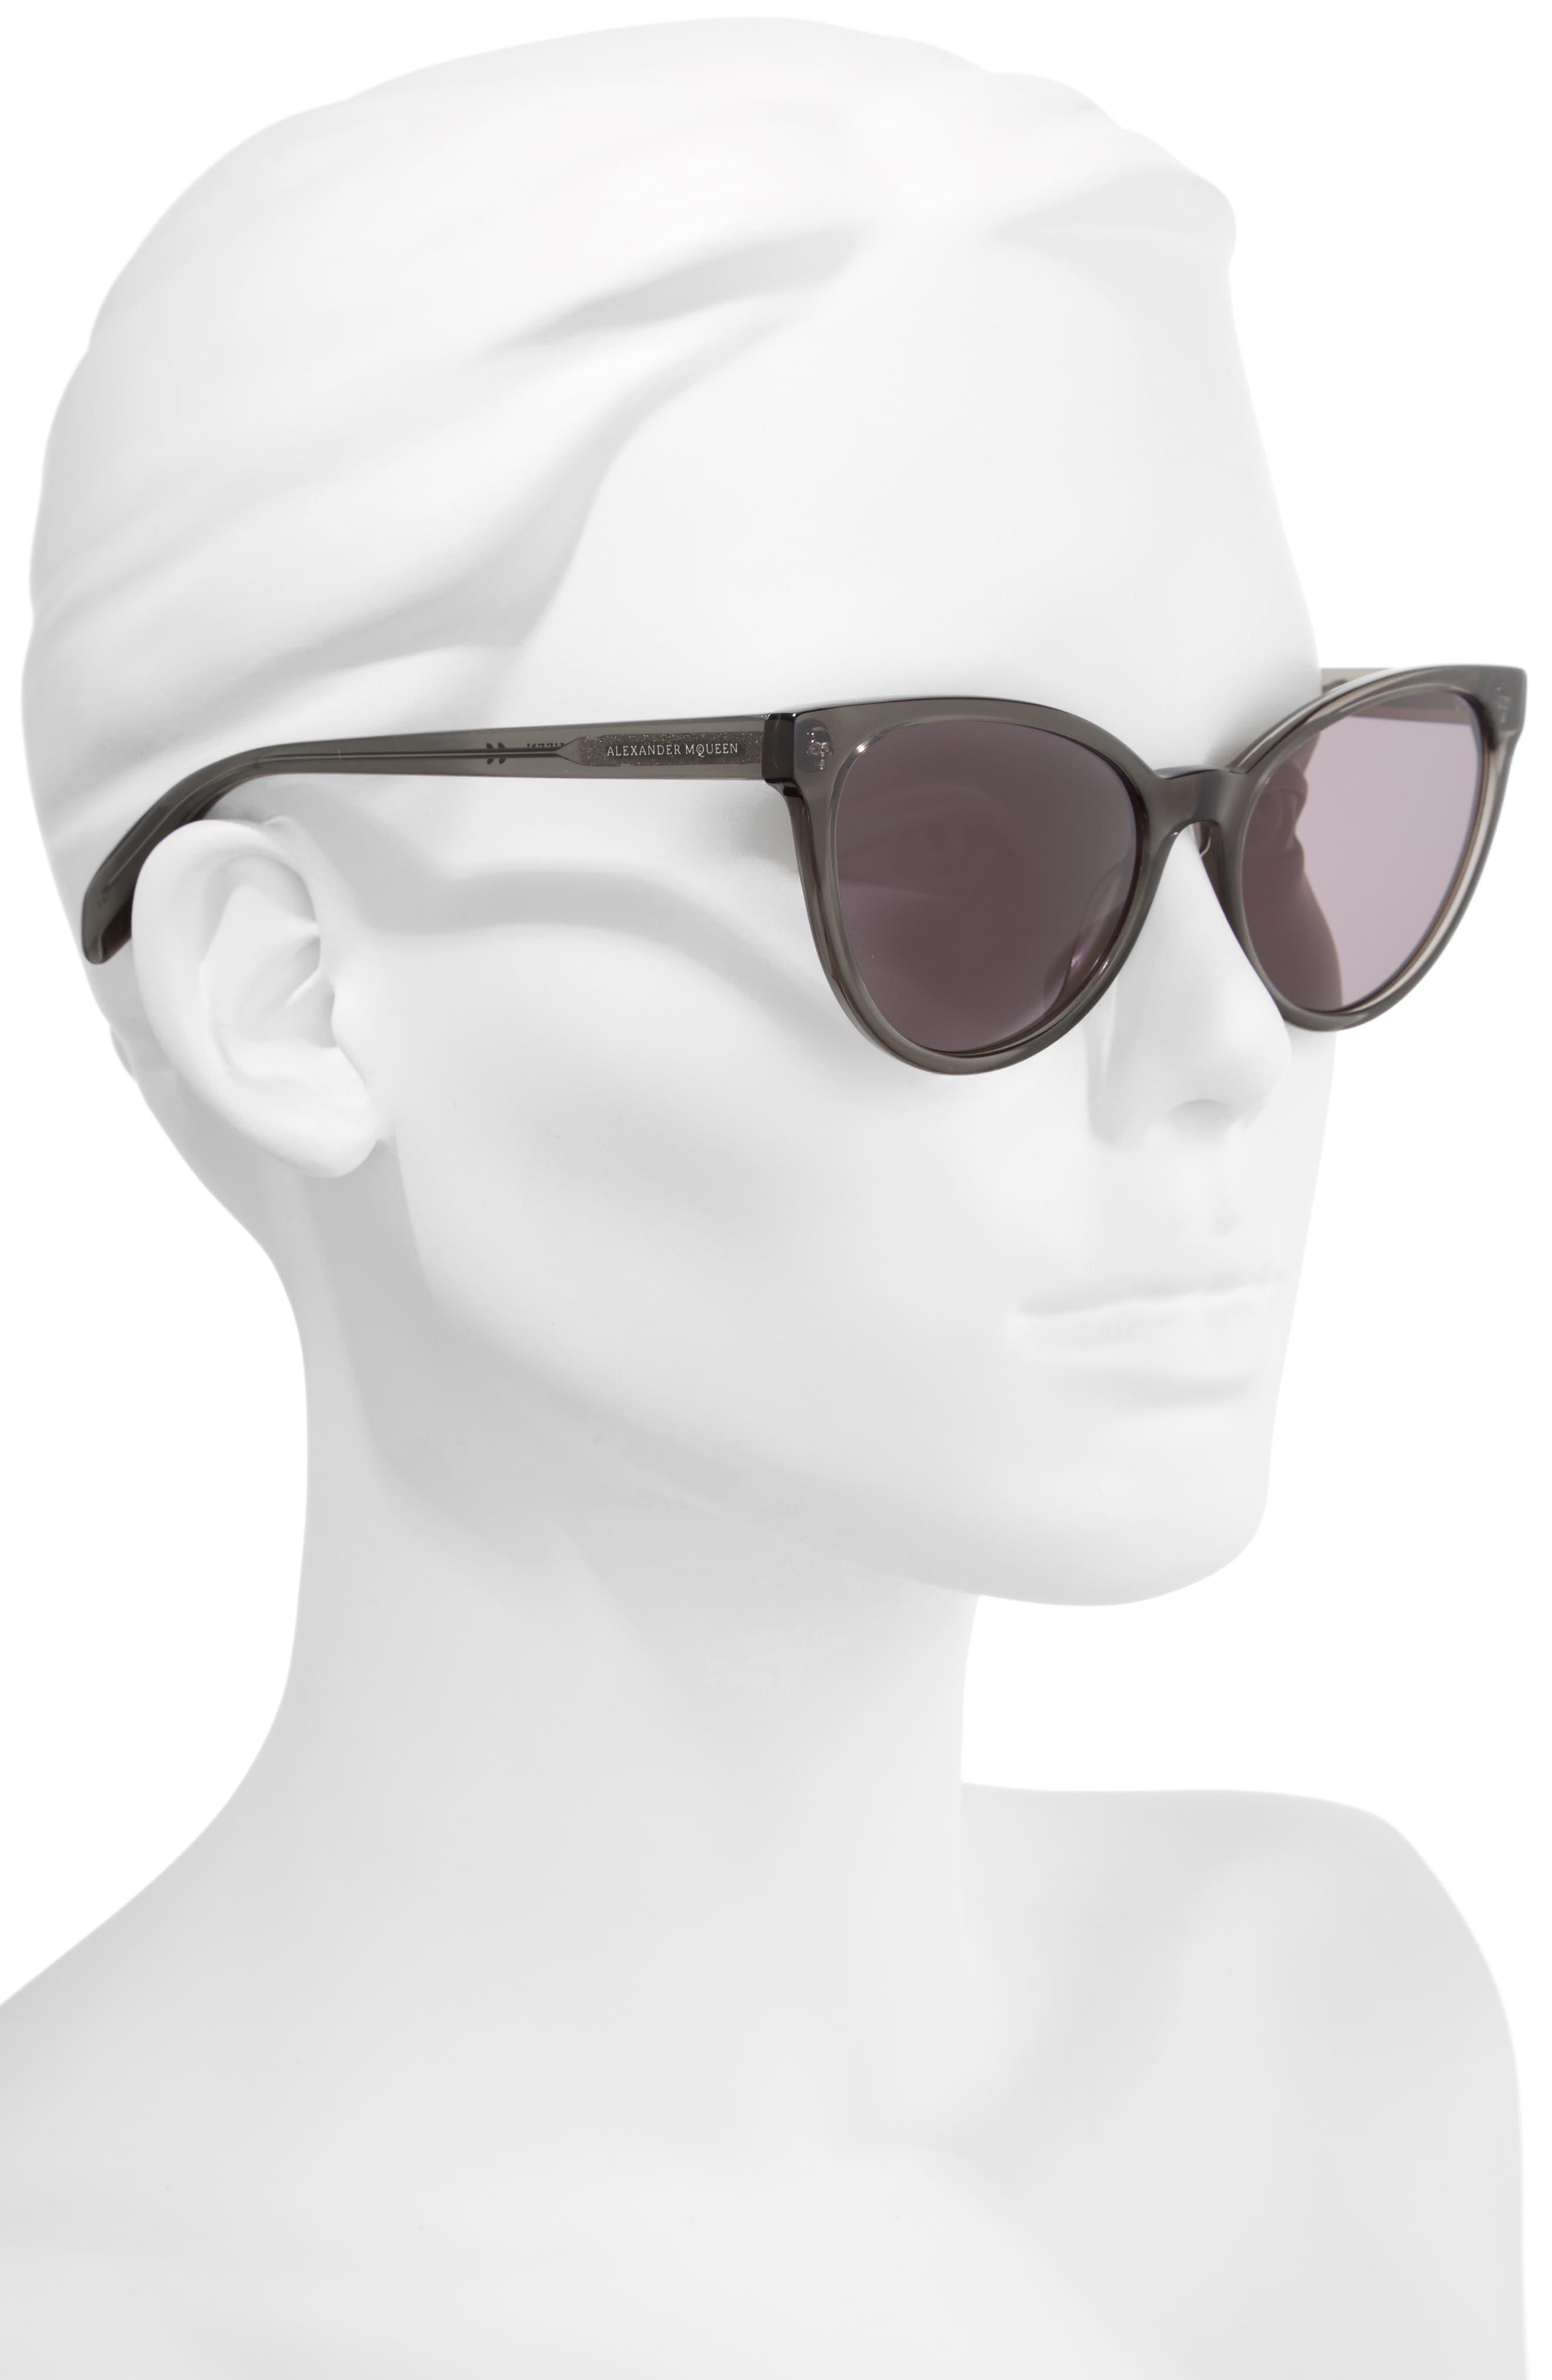 55mm Cat Eye Sunglasses,                             Alternate thumbnail 2, color,                             020